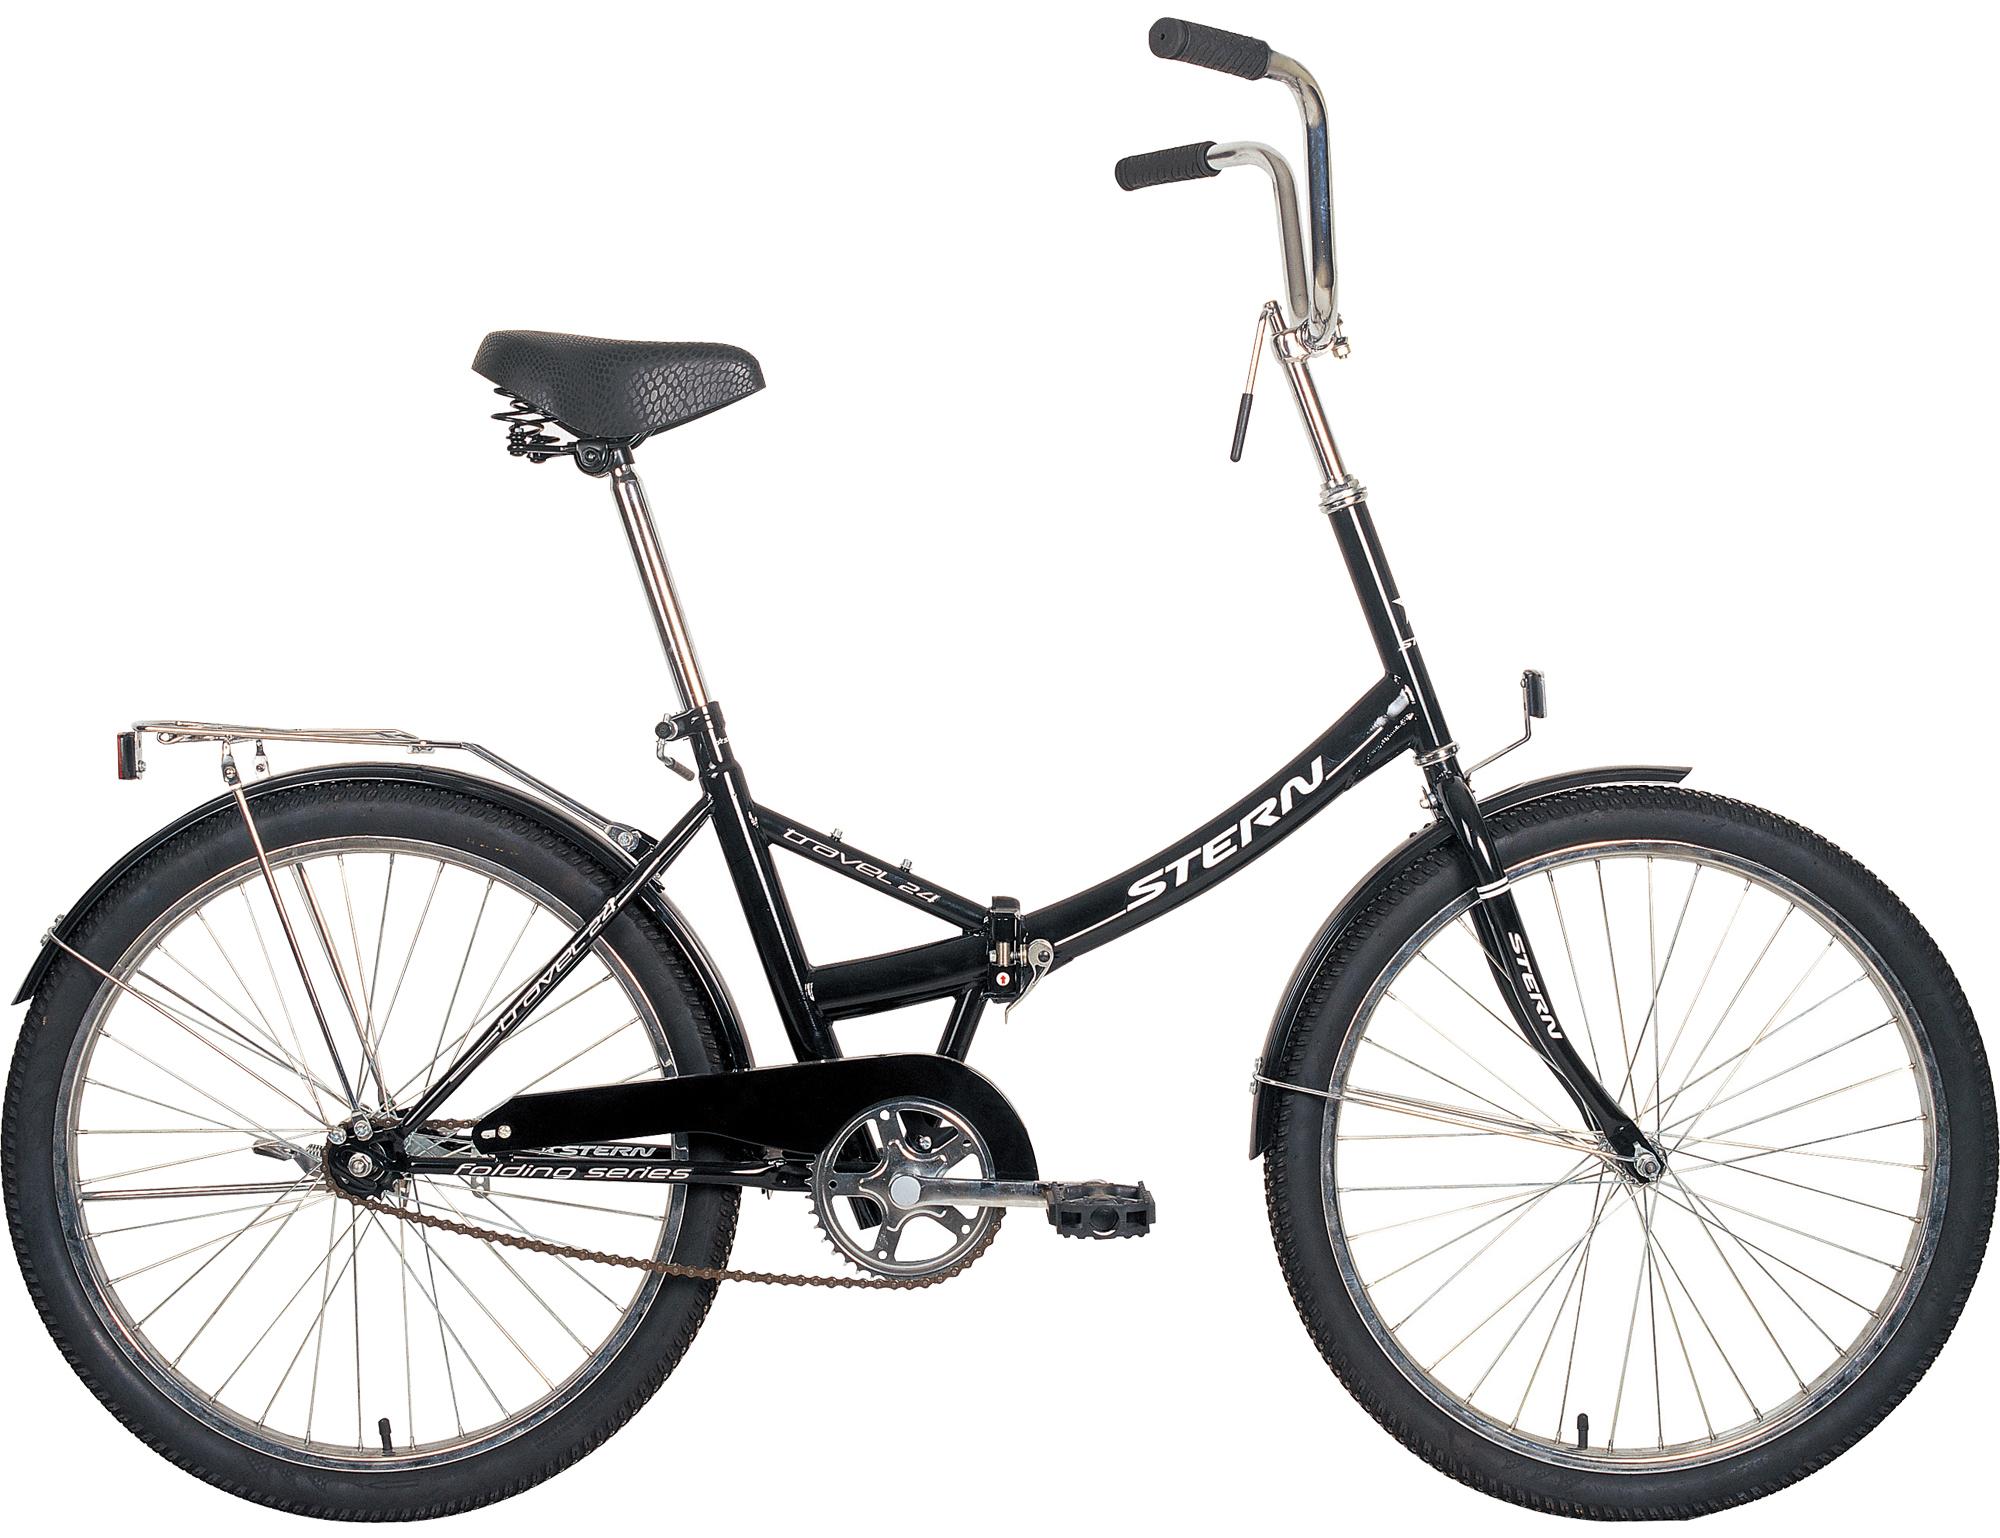 Stern Велосипед складной Stern Travel 24 stern велосипед городской stern q stom 28